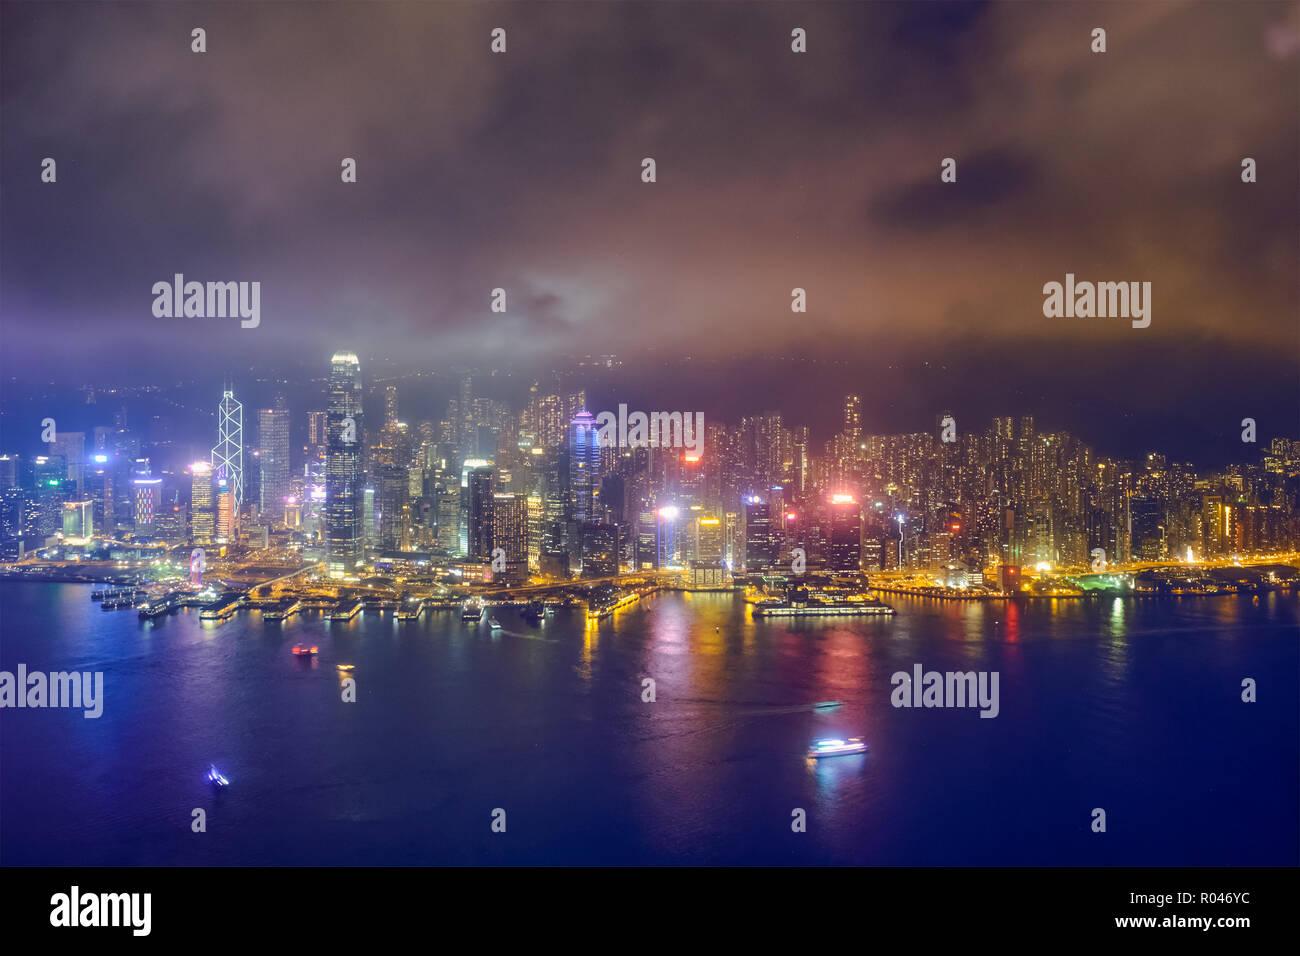 Vista aerea di illuminata skyline di Hong Kong. Hong Kong, Cina Immagini Stock